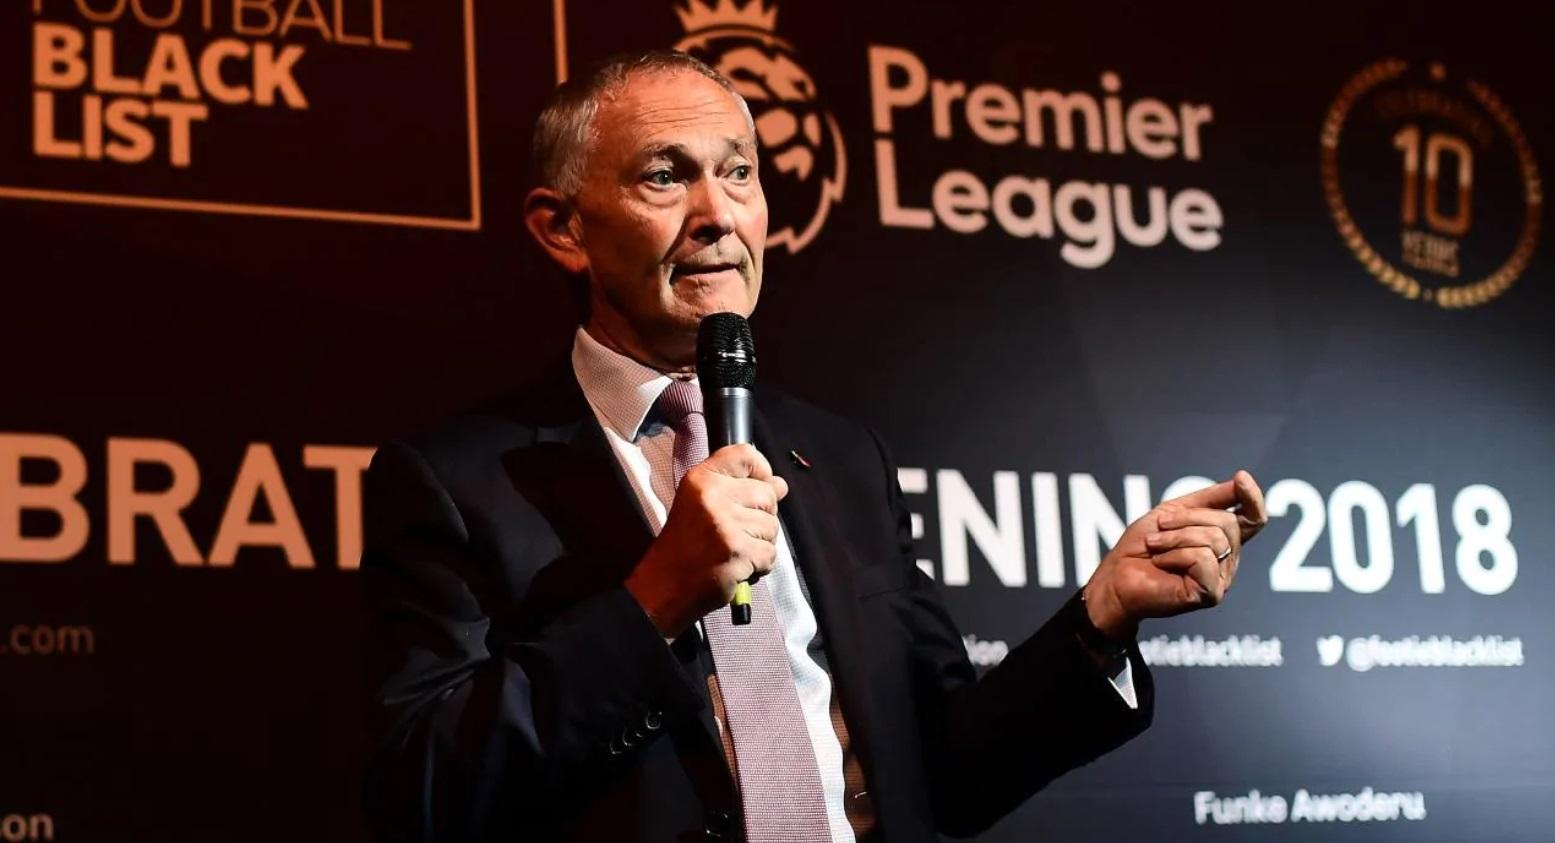 Após recusas, Premier League deve contratar novo CEO nos Estados Unidos